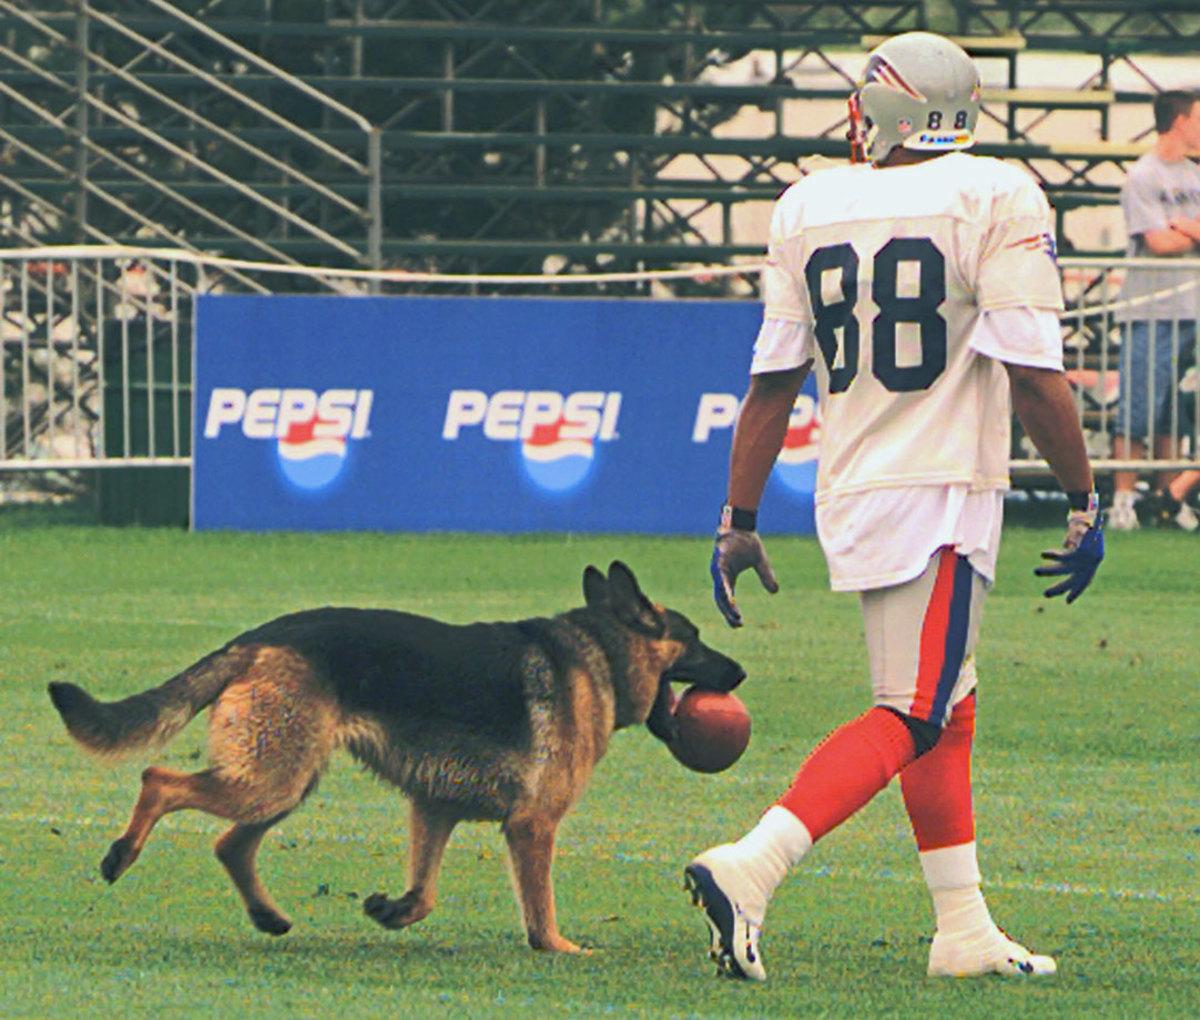 2000-Terry-Glenn-dog.jpg